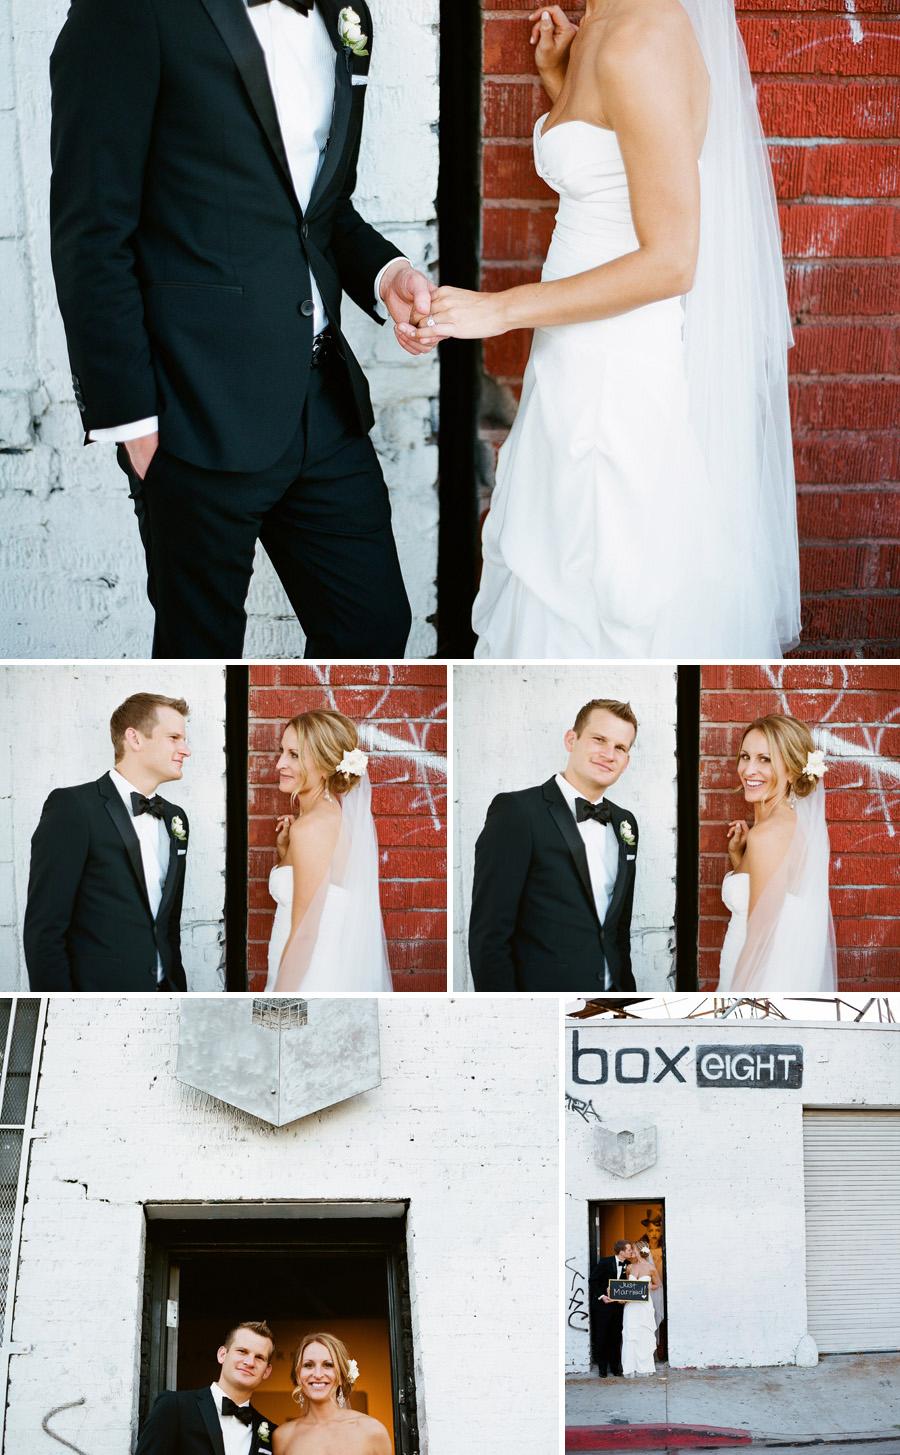 Box Eight Los Angeles Wedding Photography-comp-24